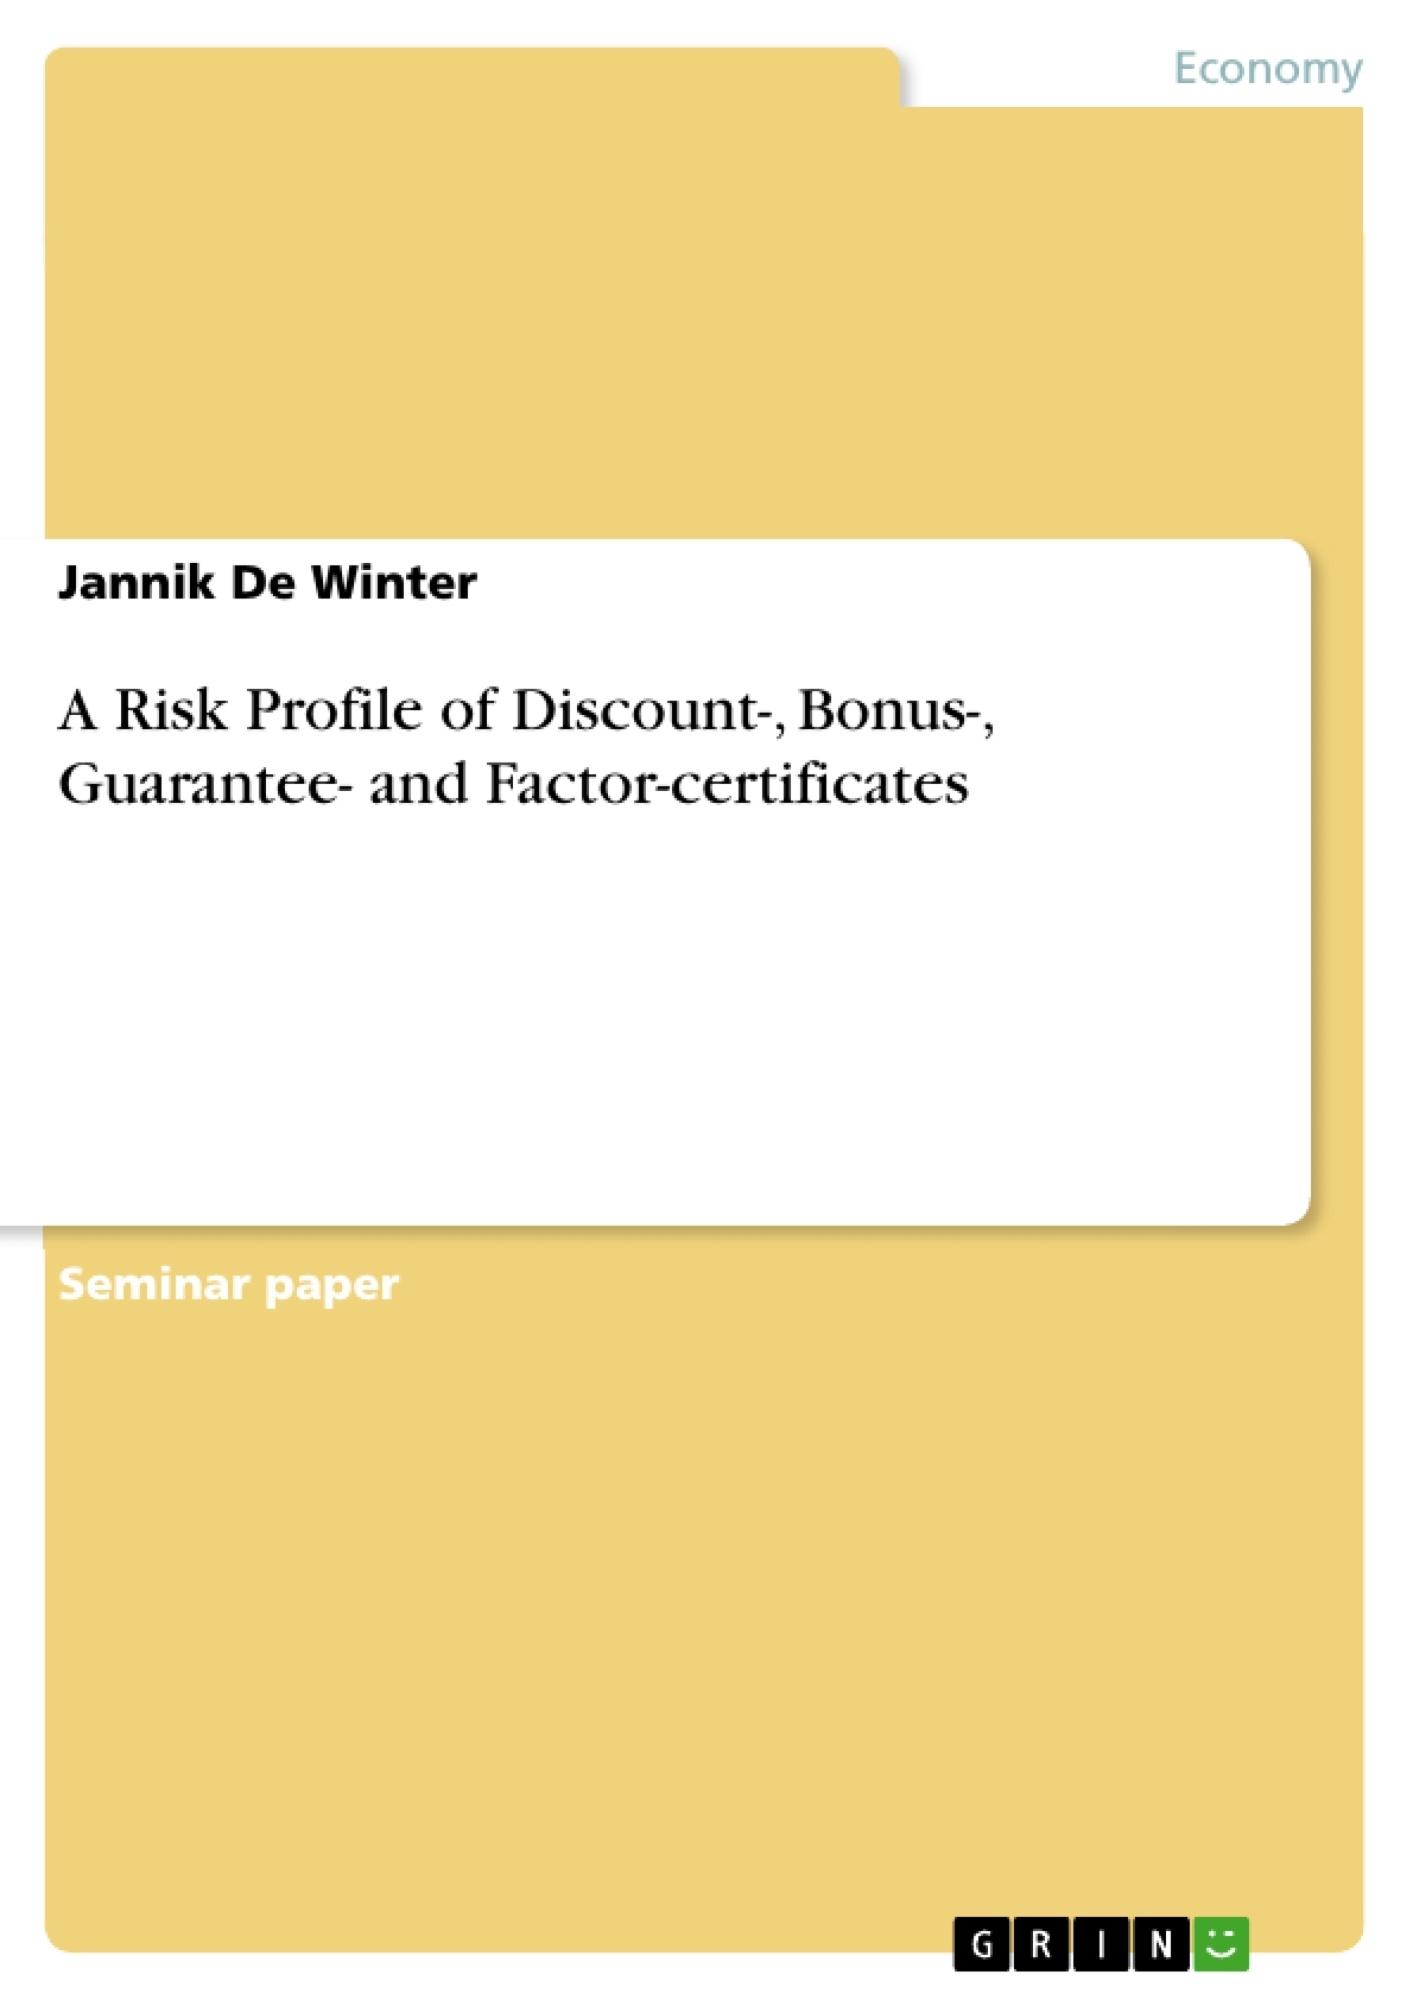 Title: A Risk Profile of Discount-, Bonus-, Guarantee- and Factor-certificates